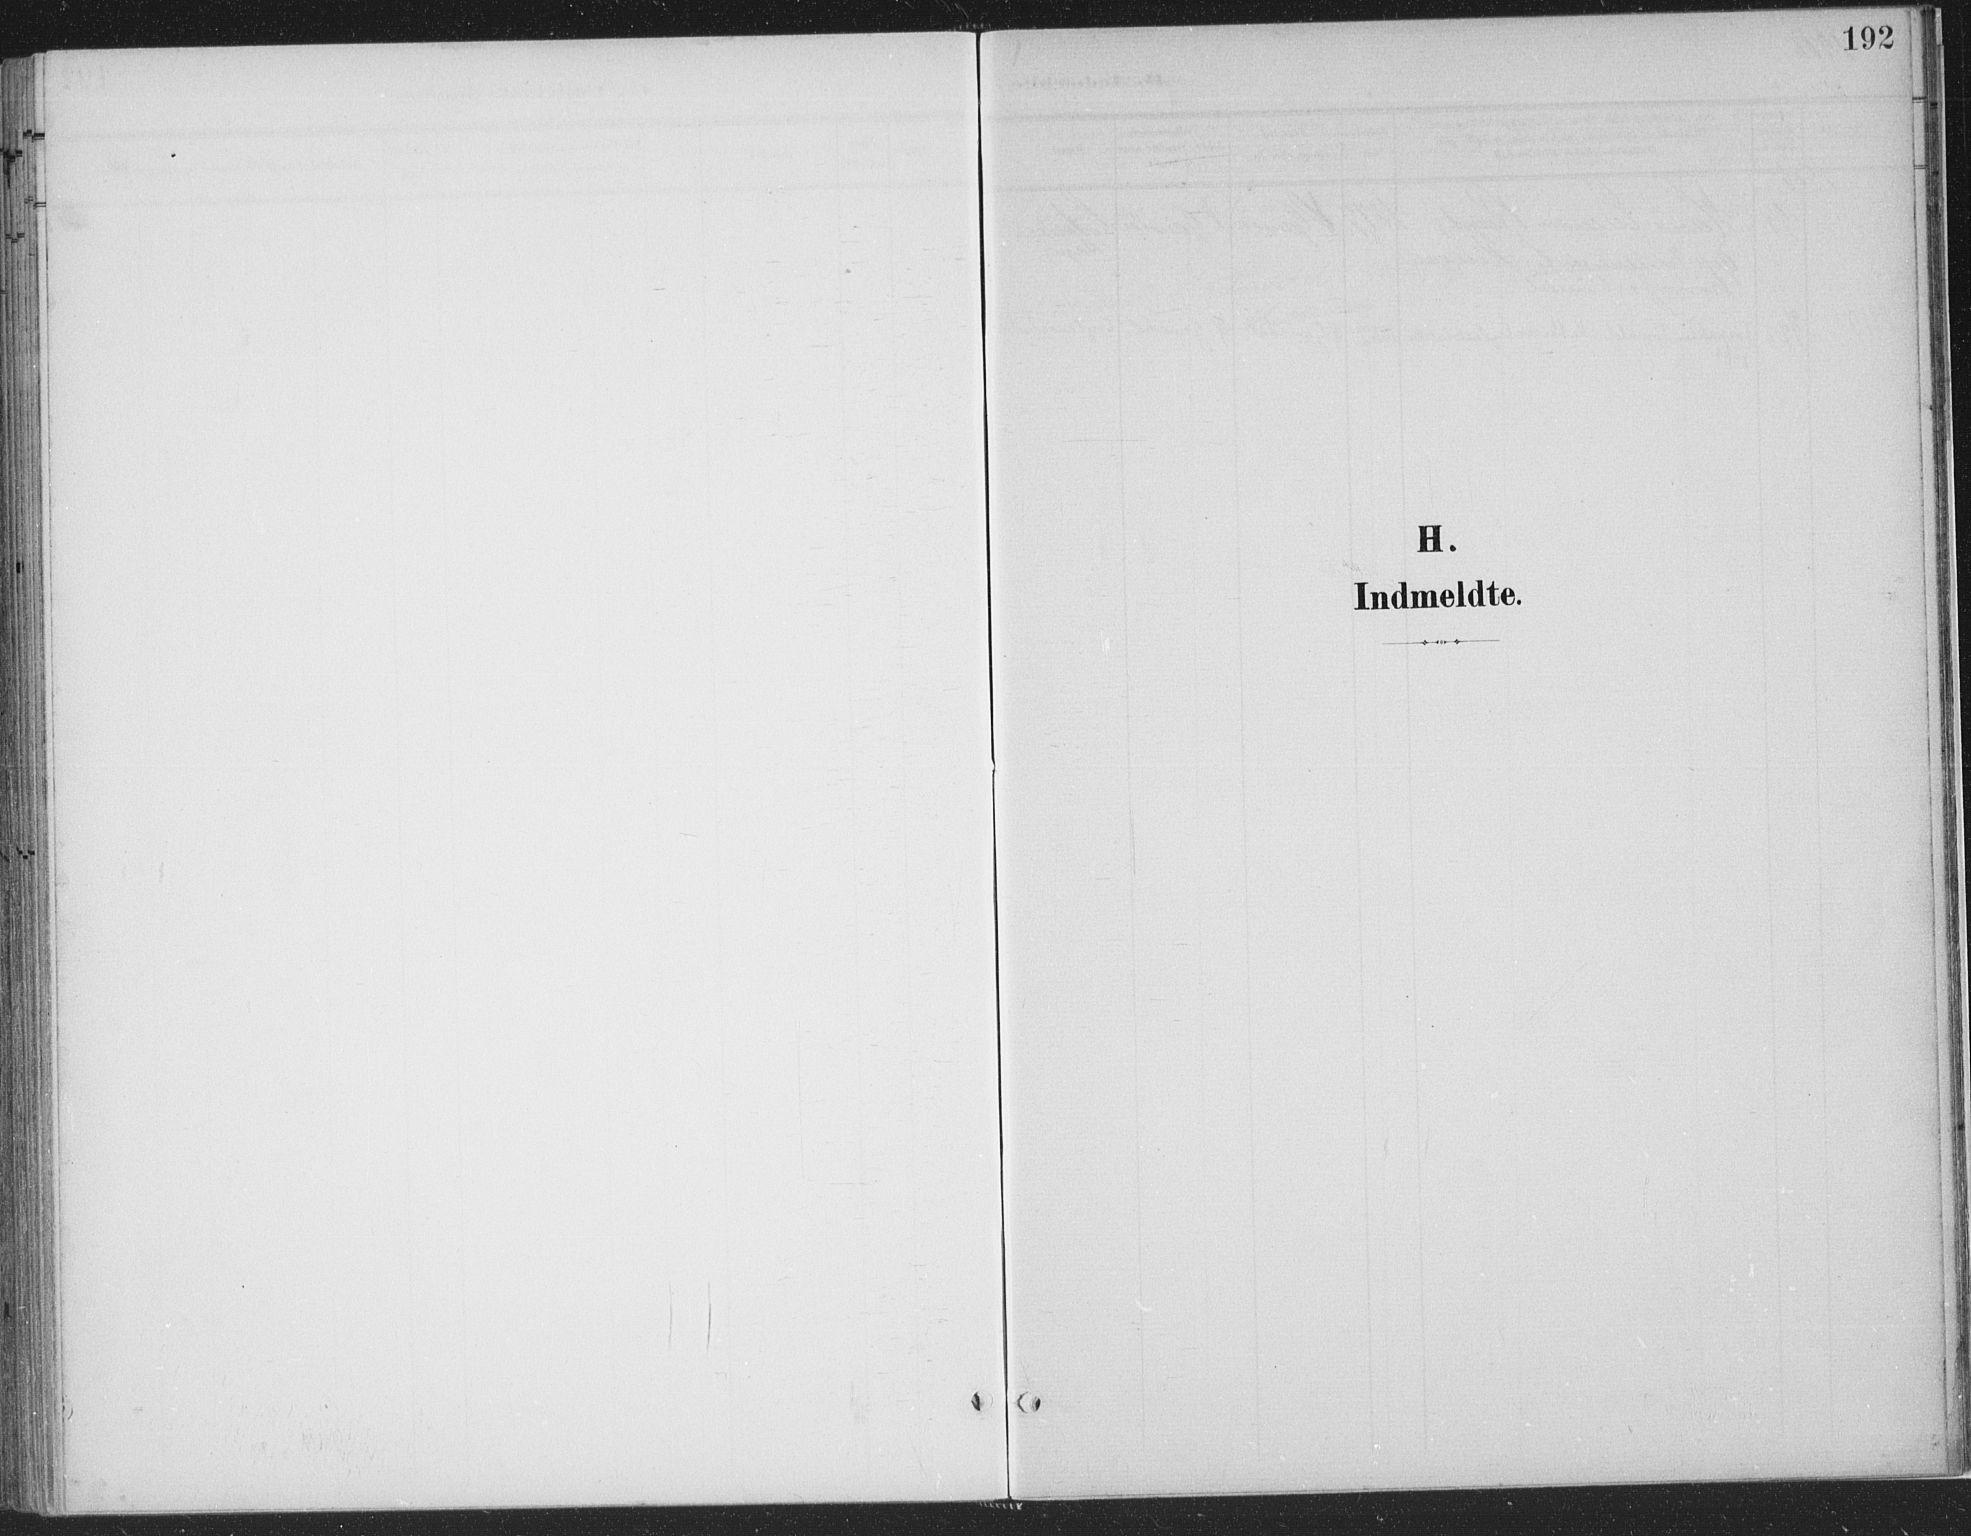 SAH, Østre Gausdal prestekontor, Ministerialbok nr. 4, 1898-1914, s. 192